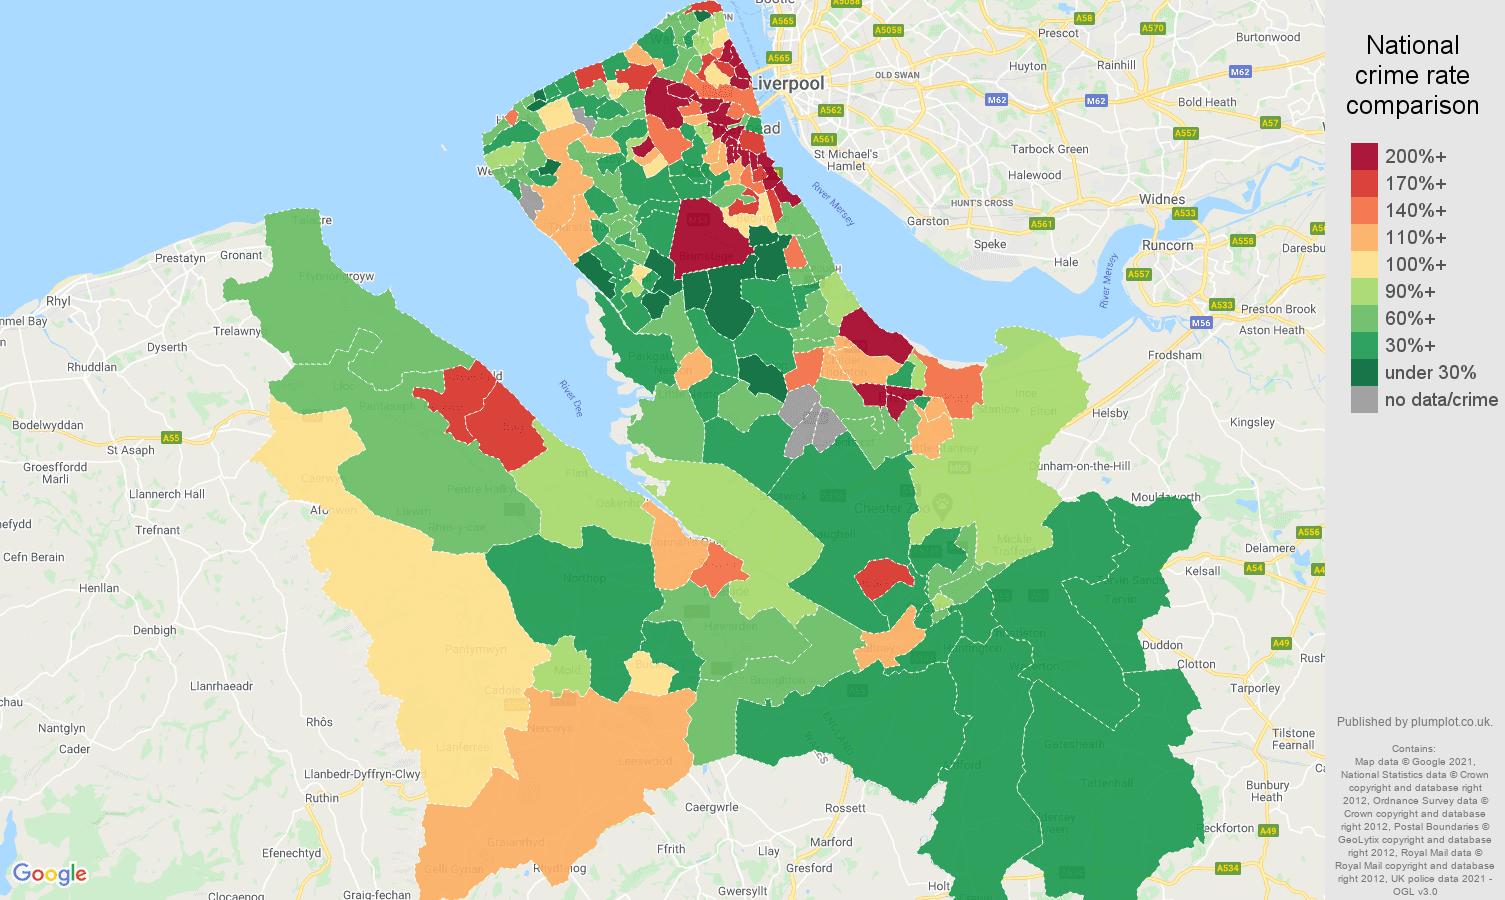 Chester criminal damage and arson crime rate comparison map